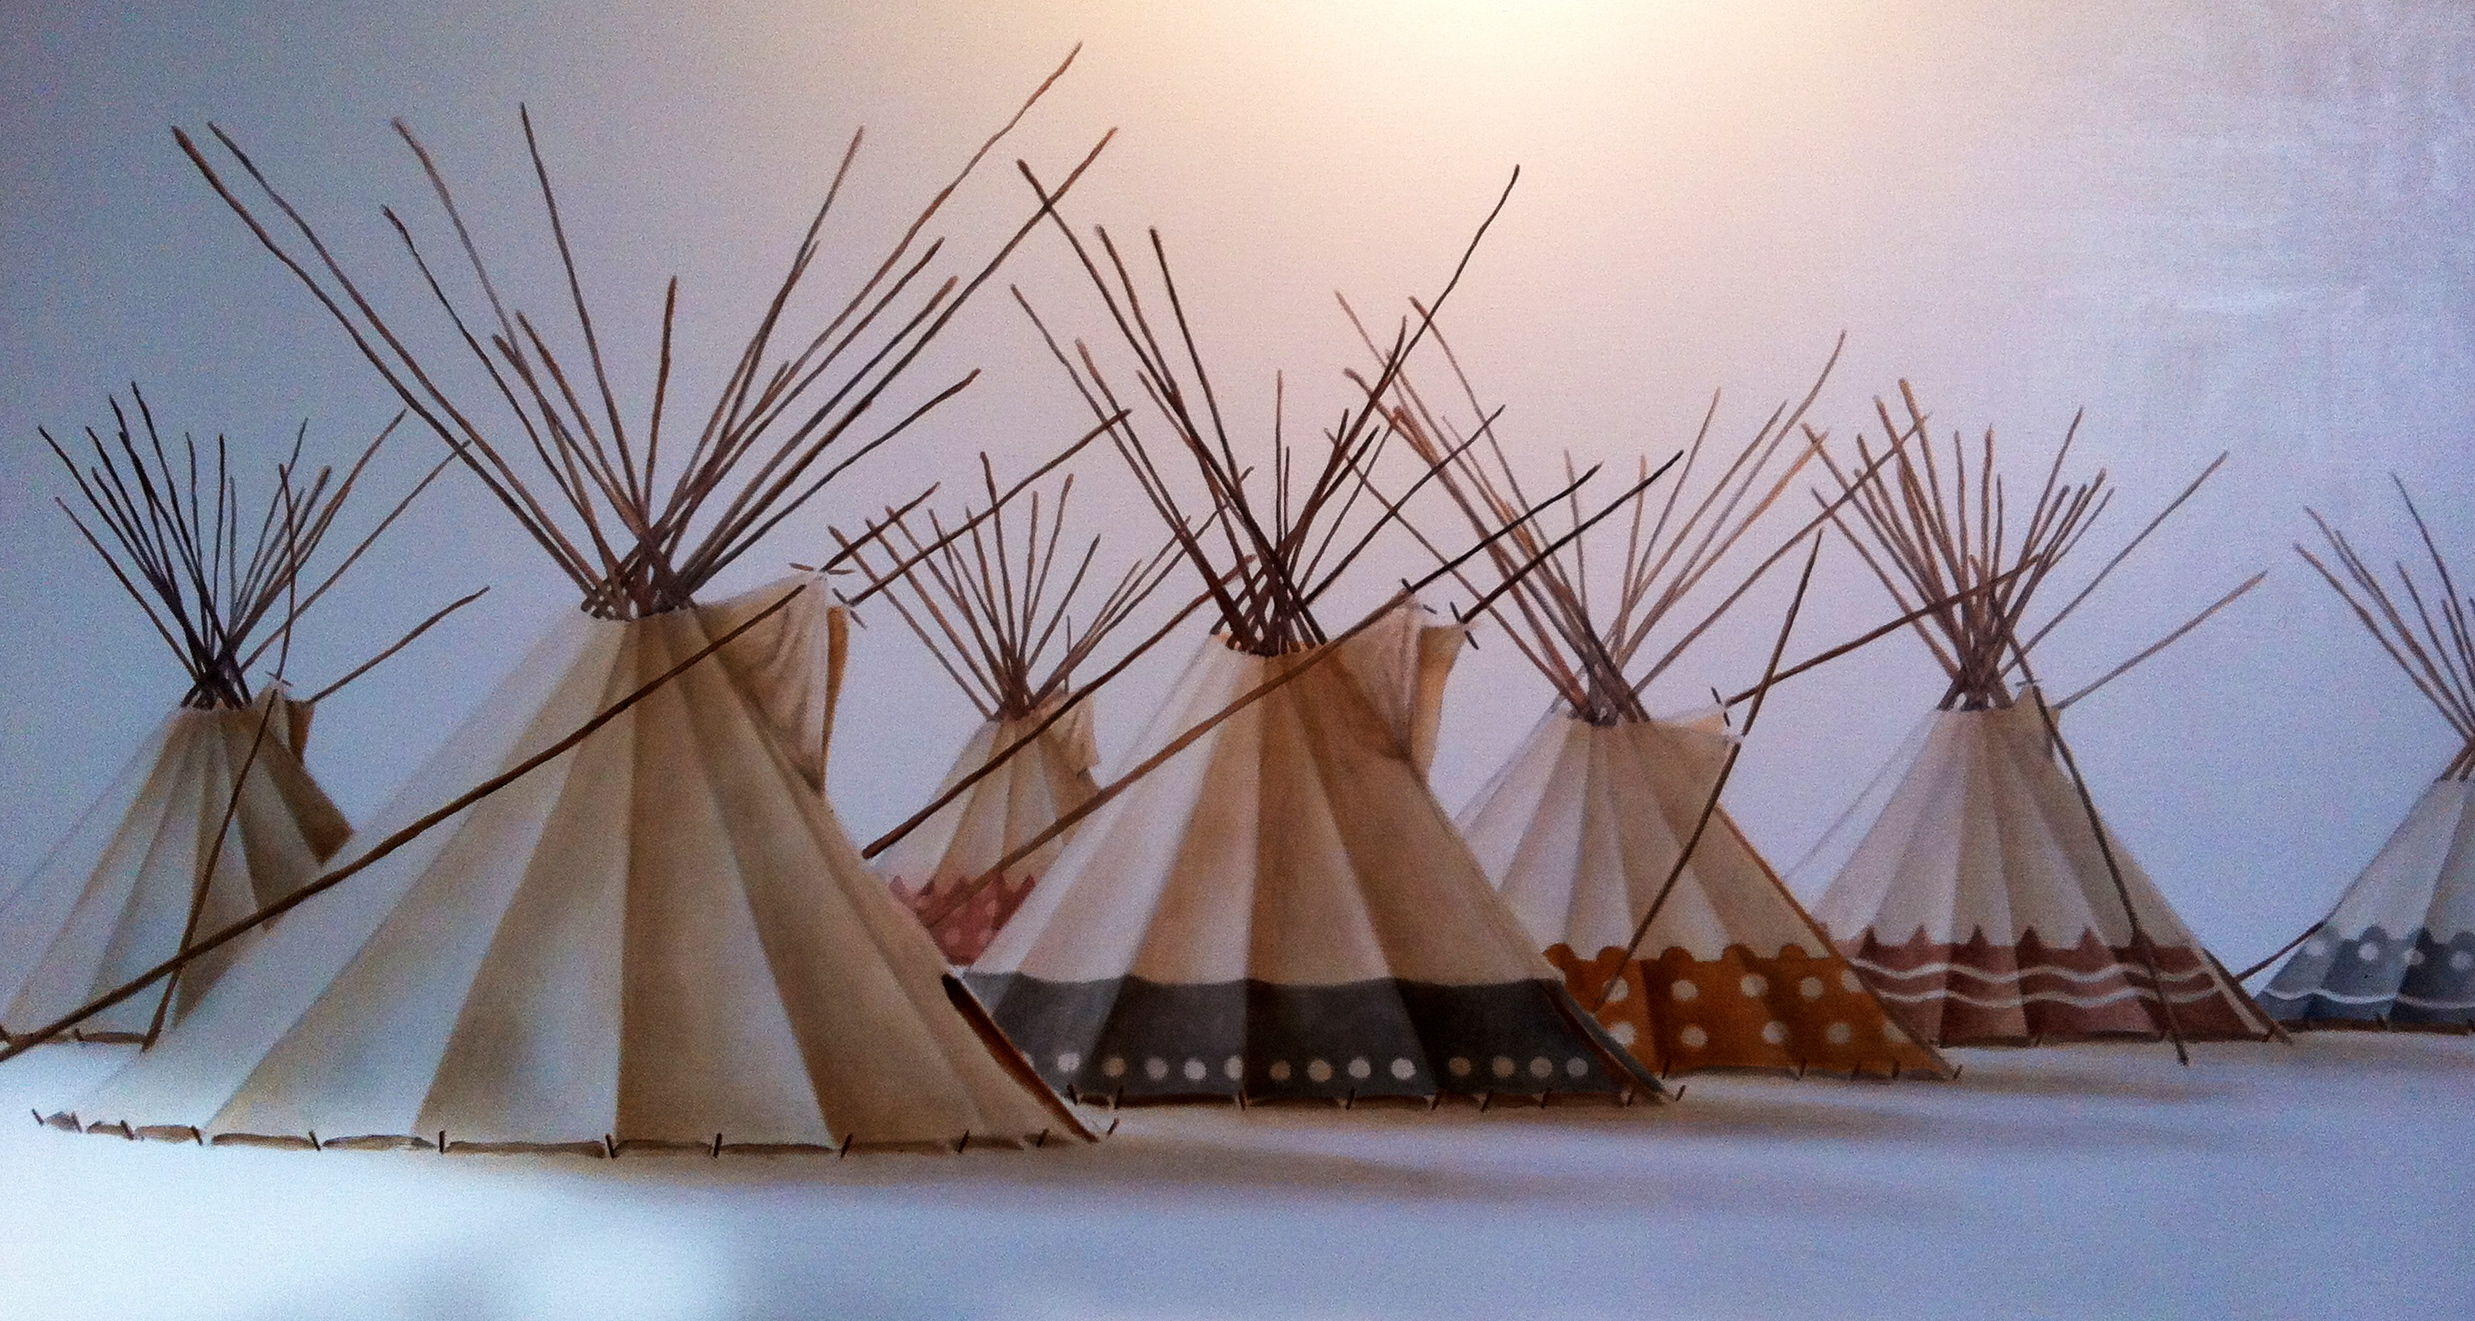 """7 Sisters Lodge Camp"" ©2012 Janice Tanton. Work in progress. Oil on linen. 40""x72"""